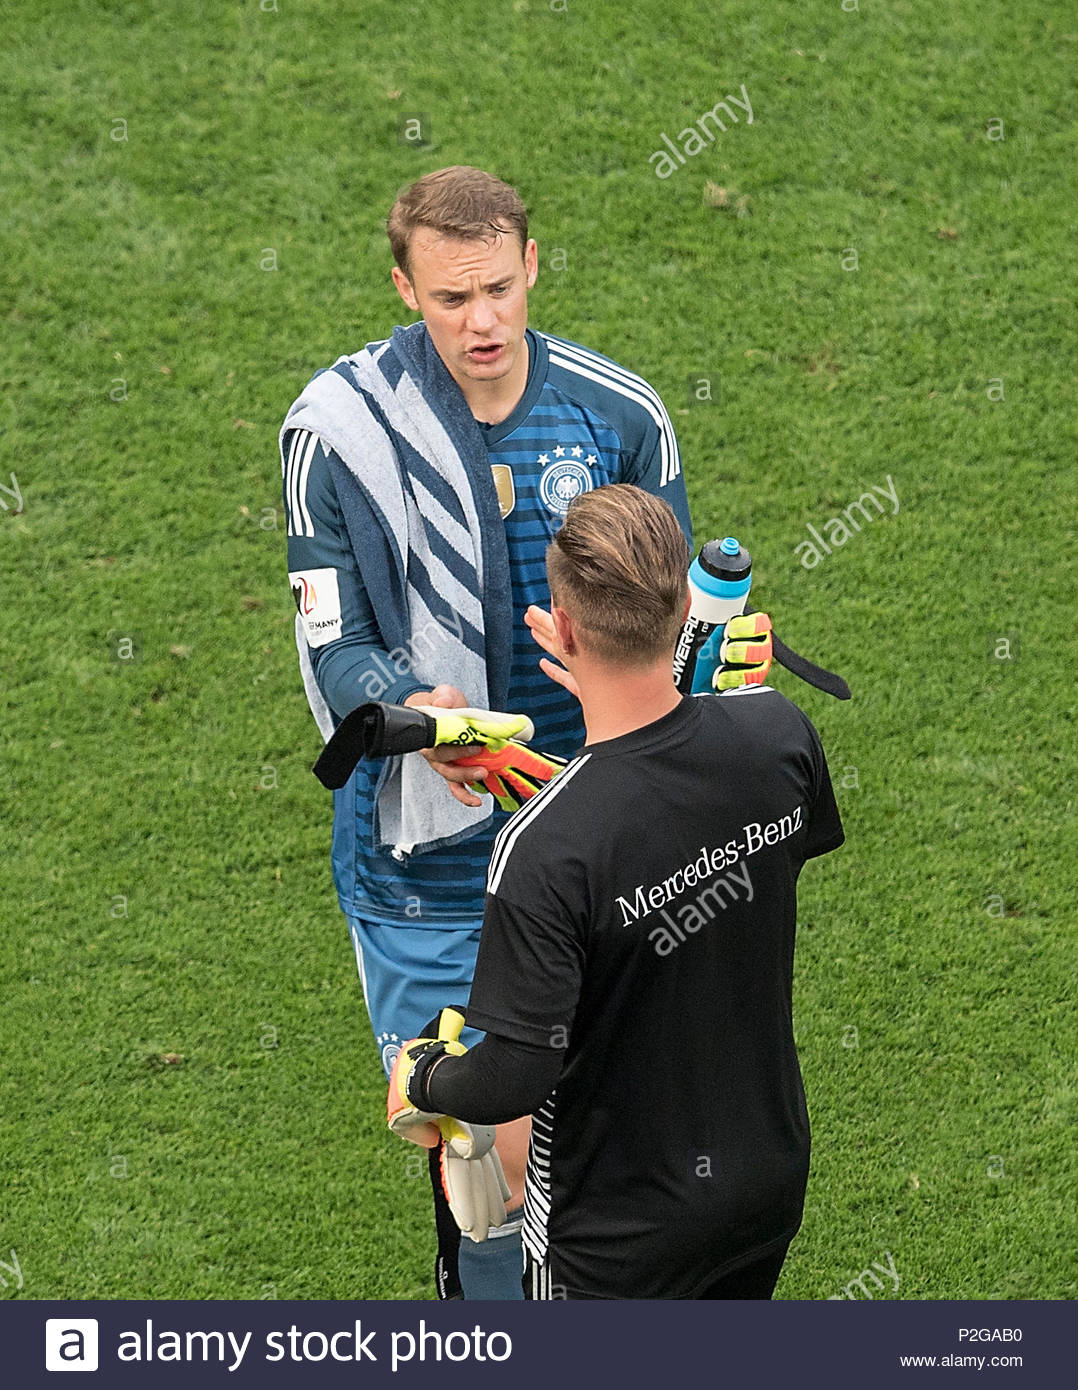 Portero Manuel Neuer l. (GER) remata el guardameta Marc-Andre TER STEGEN ( GER), Fútbol Laenderspiel, amistoso, Alemania (GER) - Arabia Saudita (KSA)  2: 1,